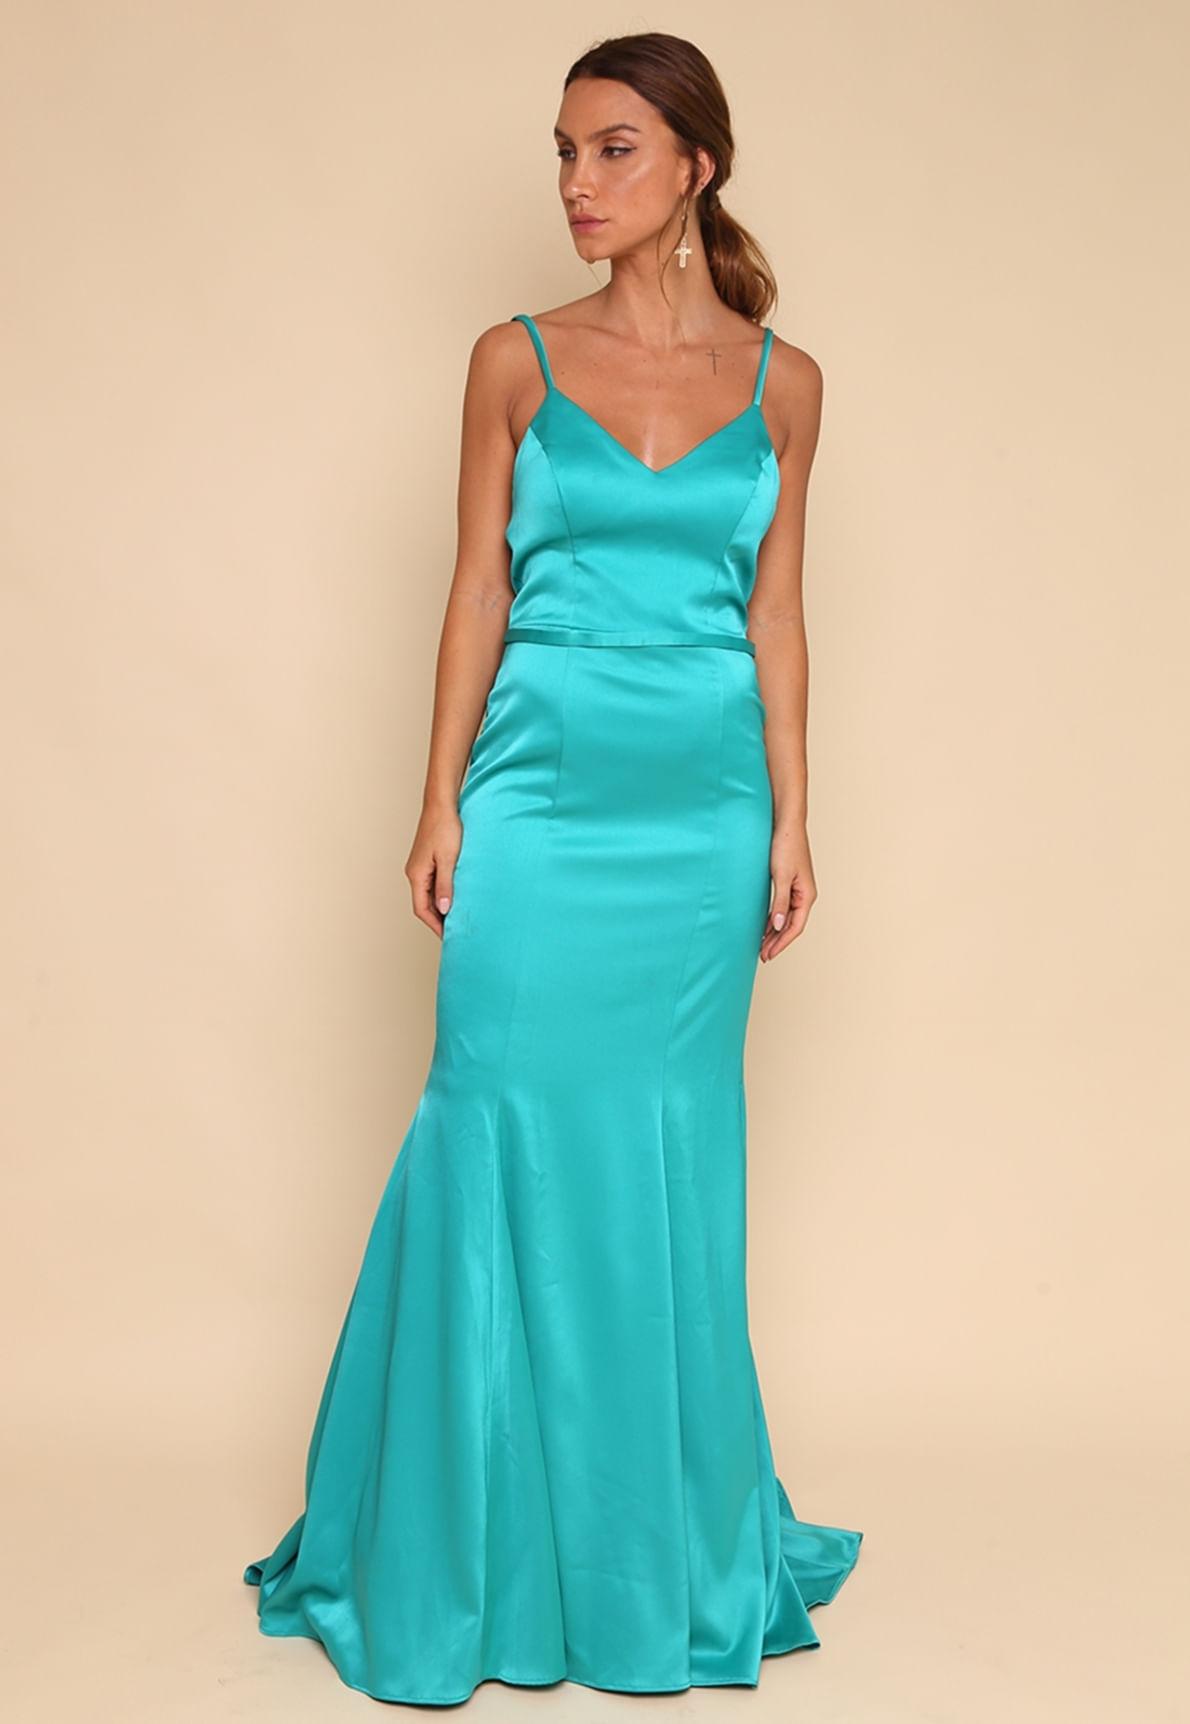 30870-vestido-longo-verde-agua-isadora-mundo-lolita-01